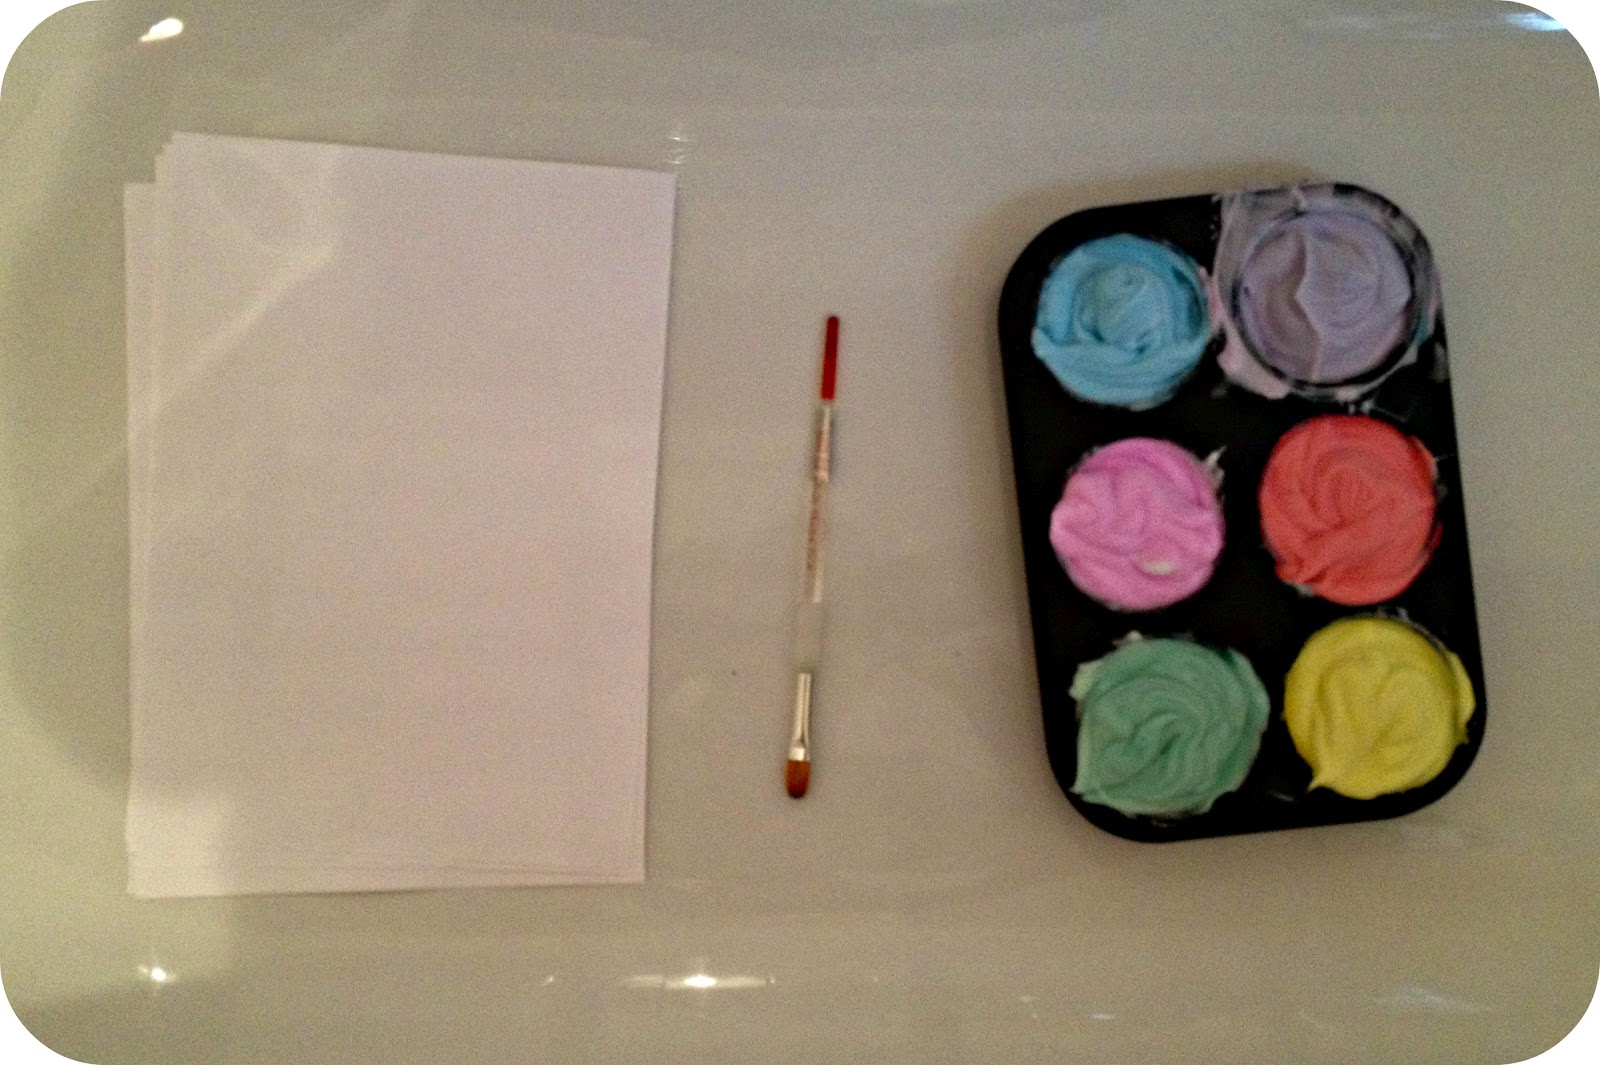 Transatlantic blonde messy play shaving cream painting for Shaving cream paint